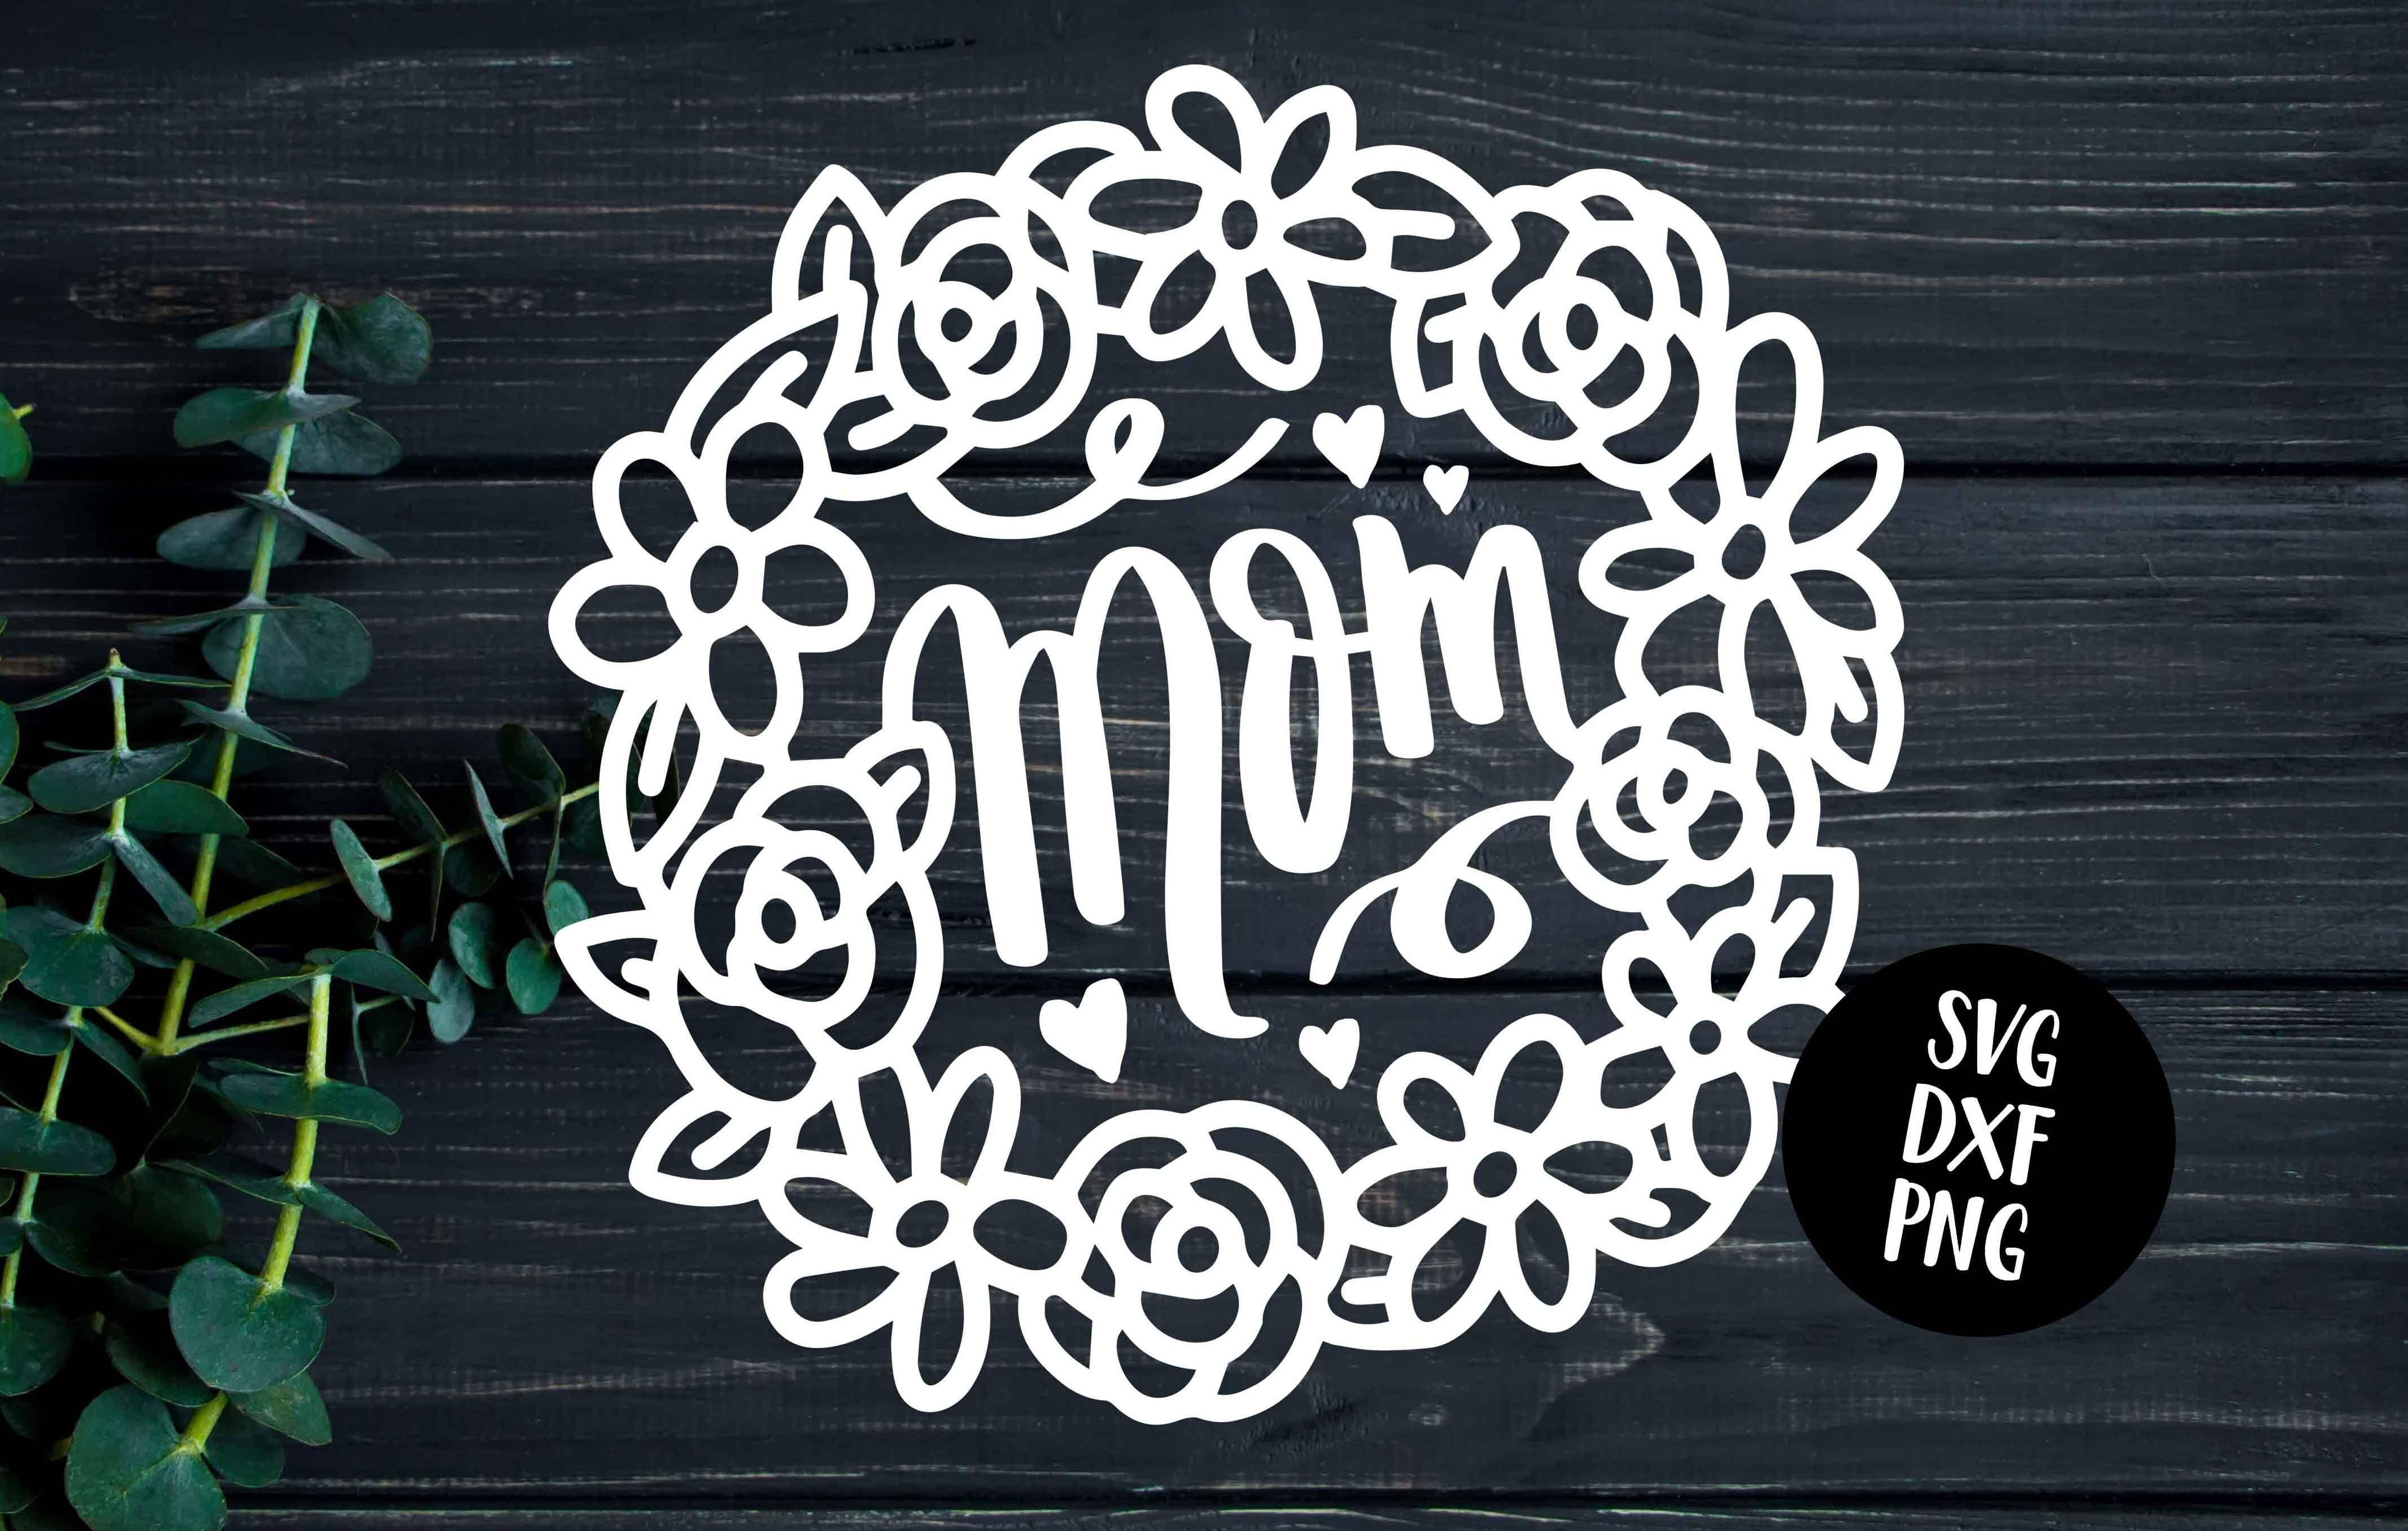 Mom Floral Frame Svg Dxf Png By Svgfox Thehungryjpeg Com